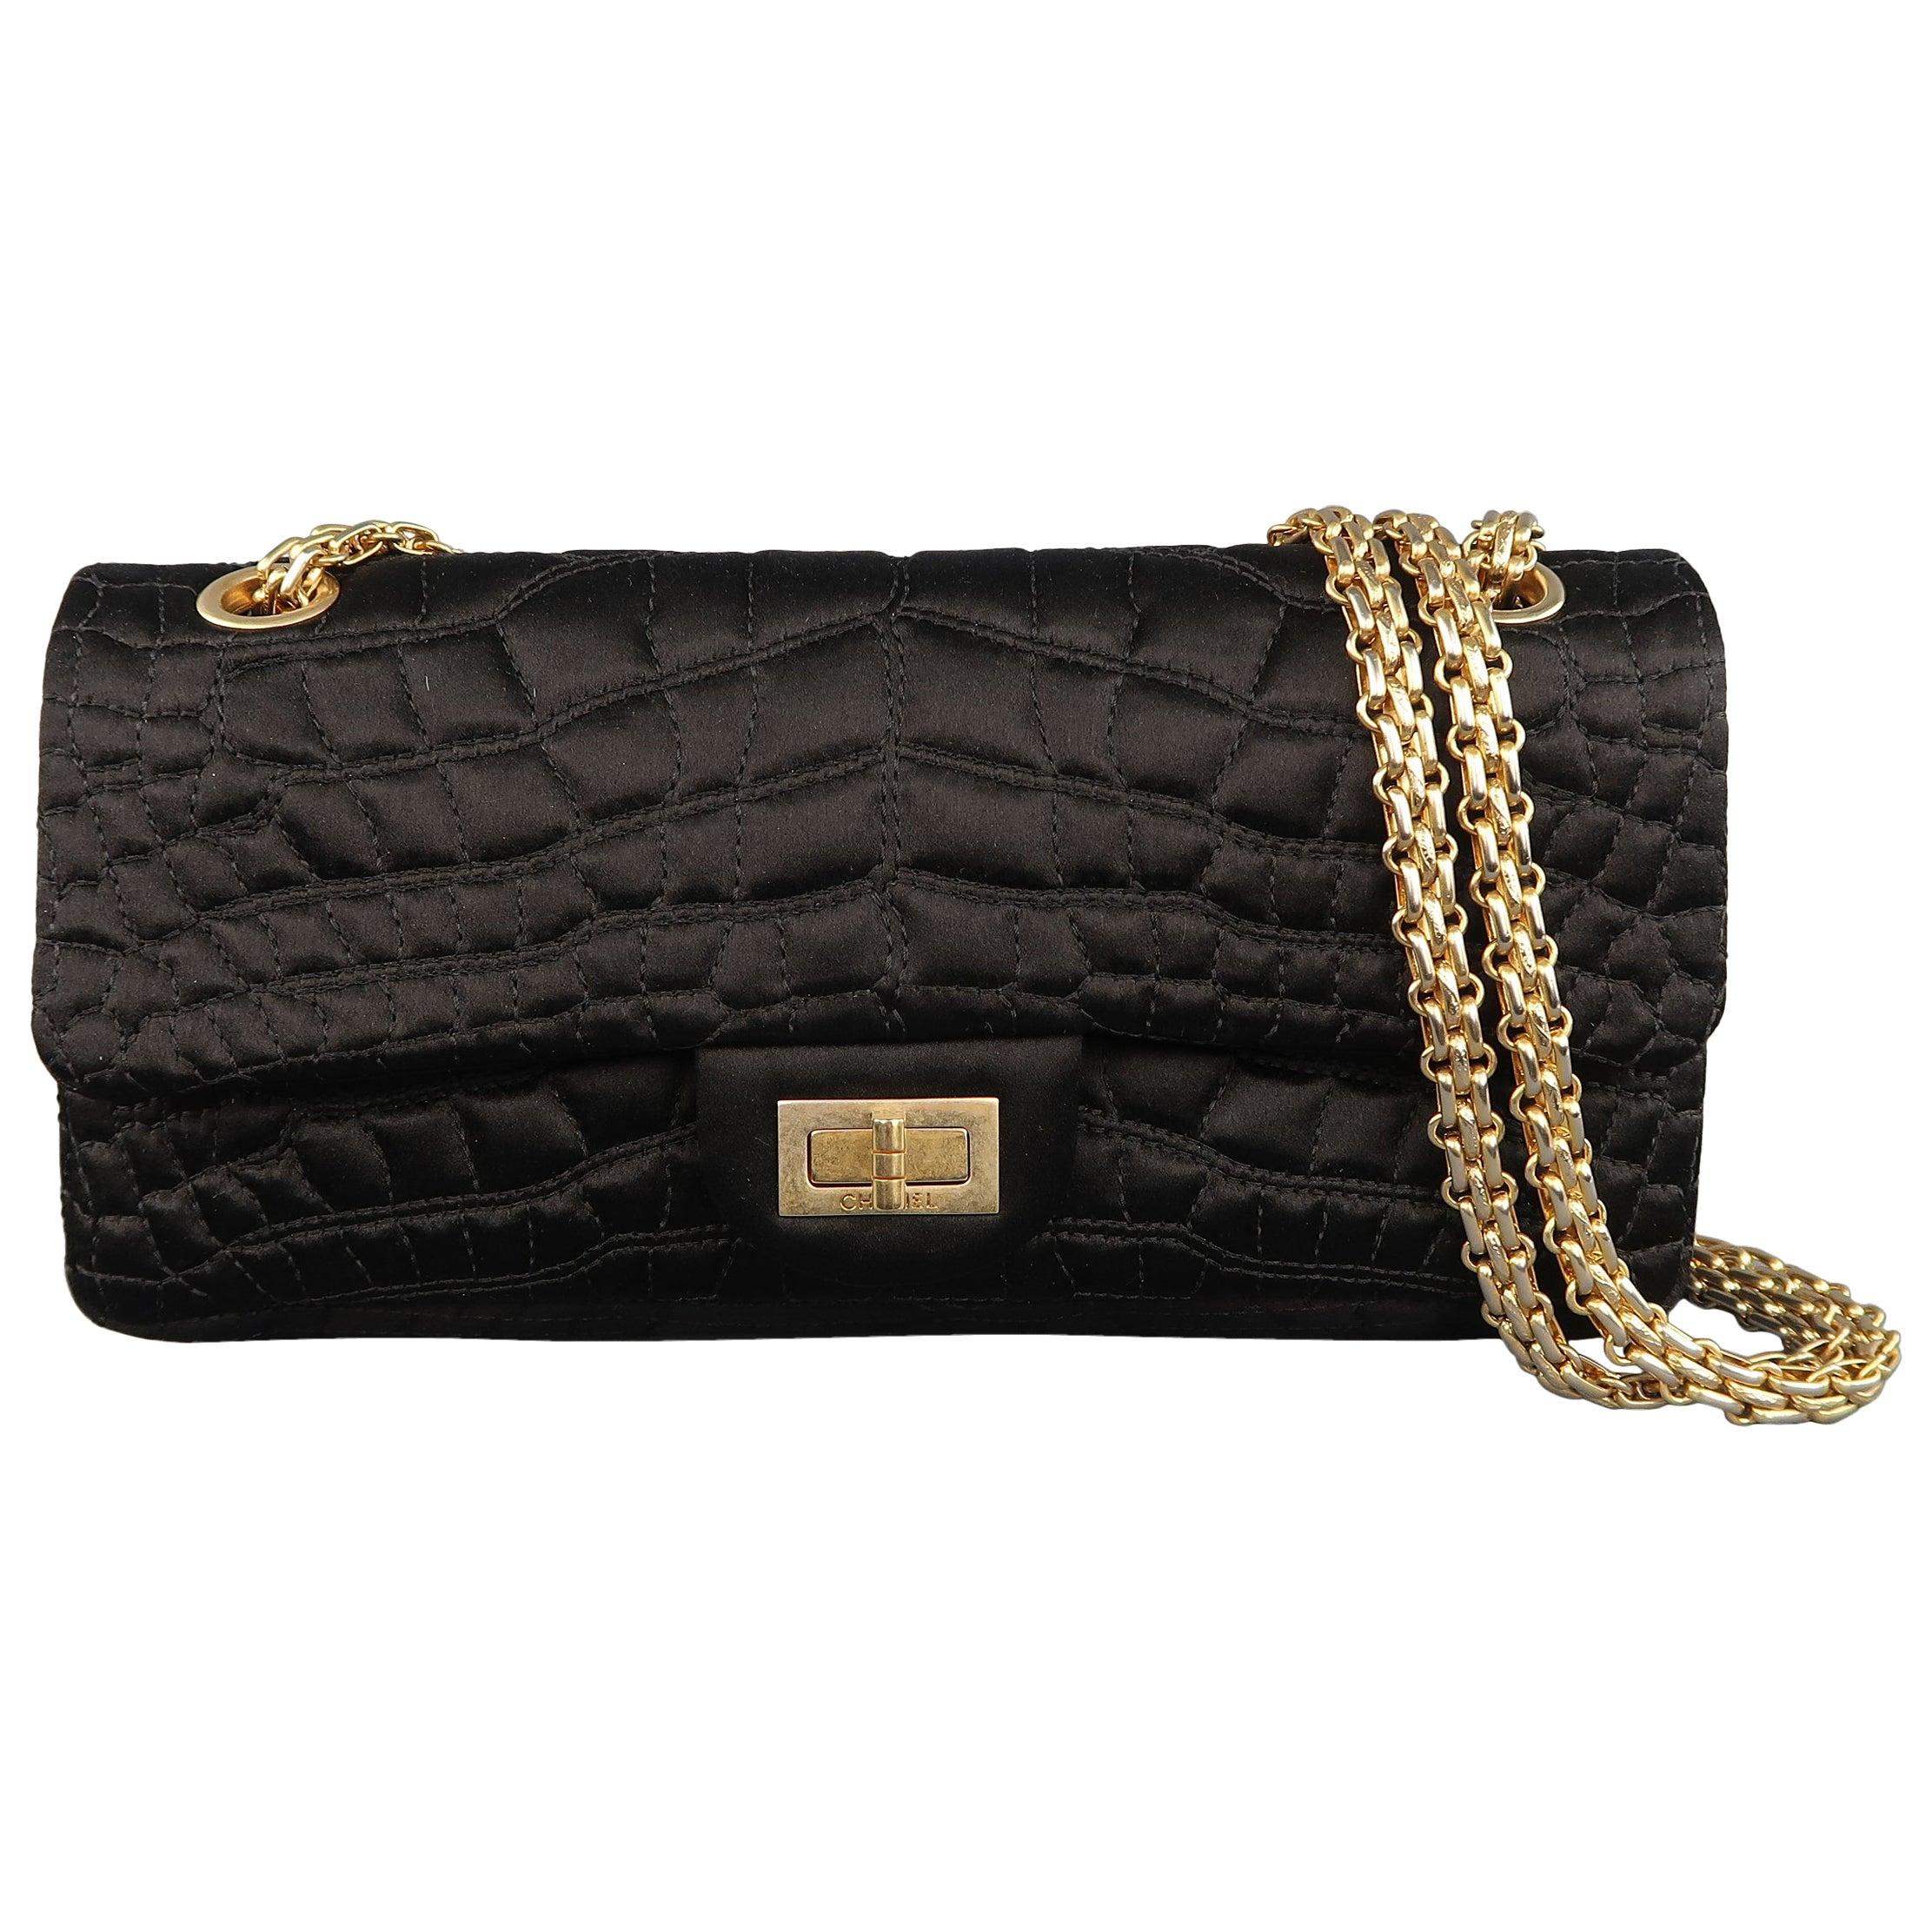 Chanel Handbag - Black Alligator Quilted Silk Gold Chain Reissue Shoulder Bag